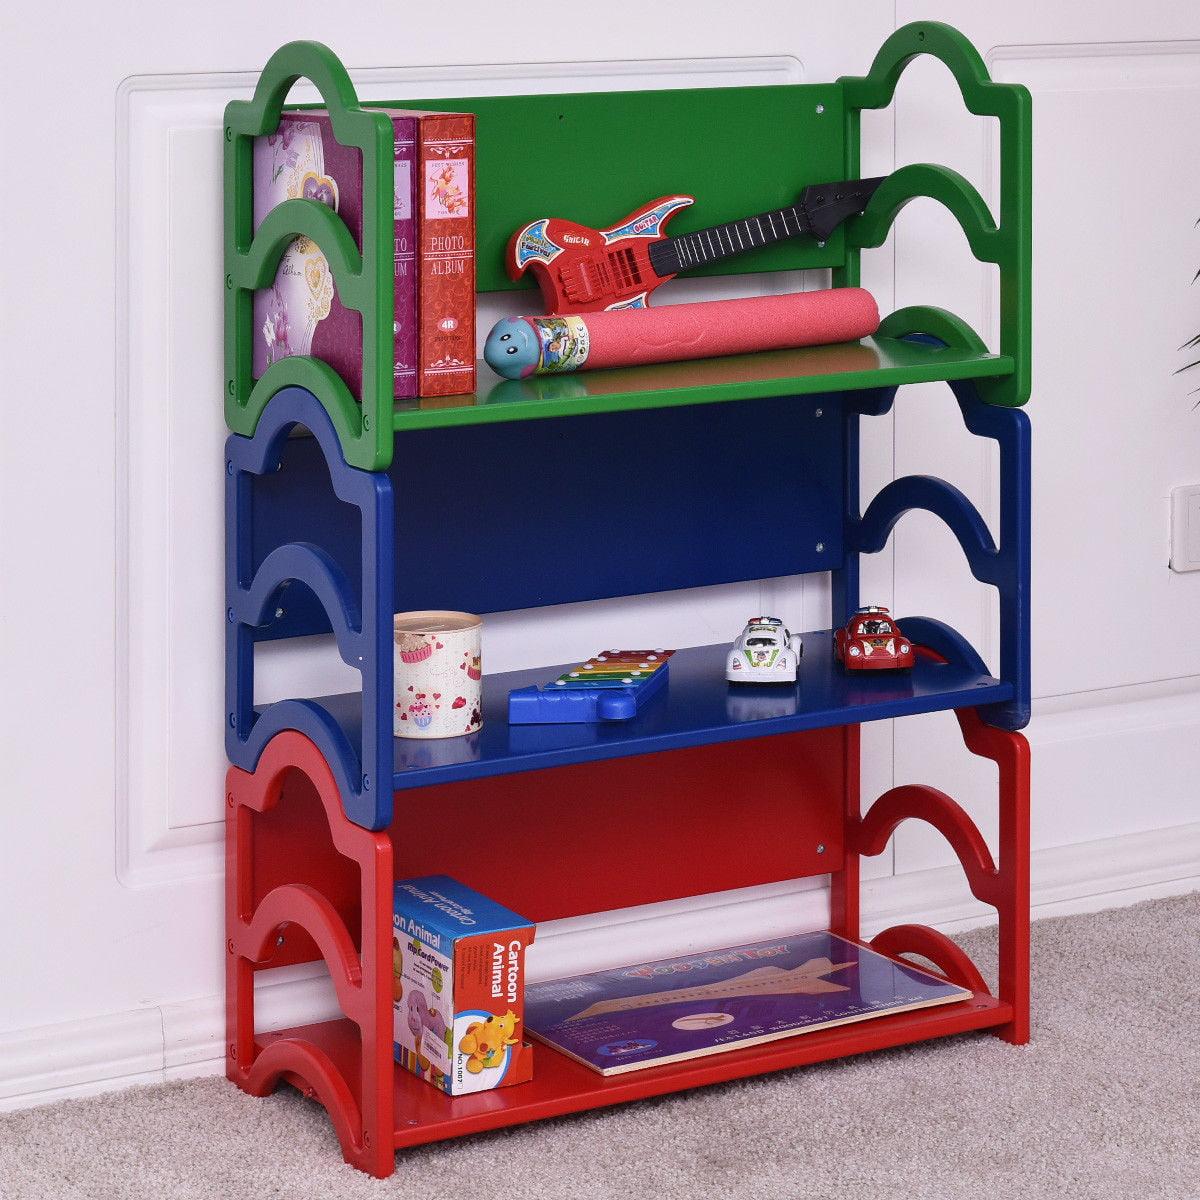 Gymax Kids Book Shelf Storage Rack Organizer Bookcase Display Holder Home Furniture - image 10 of 10